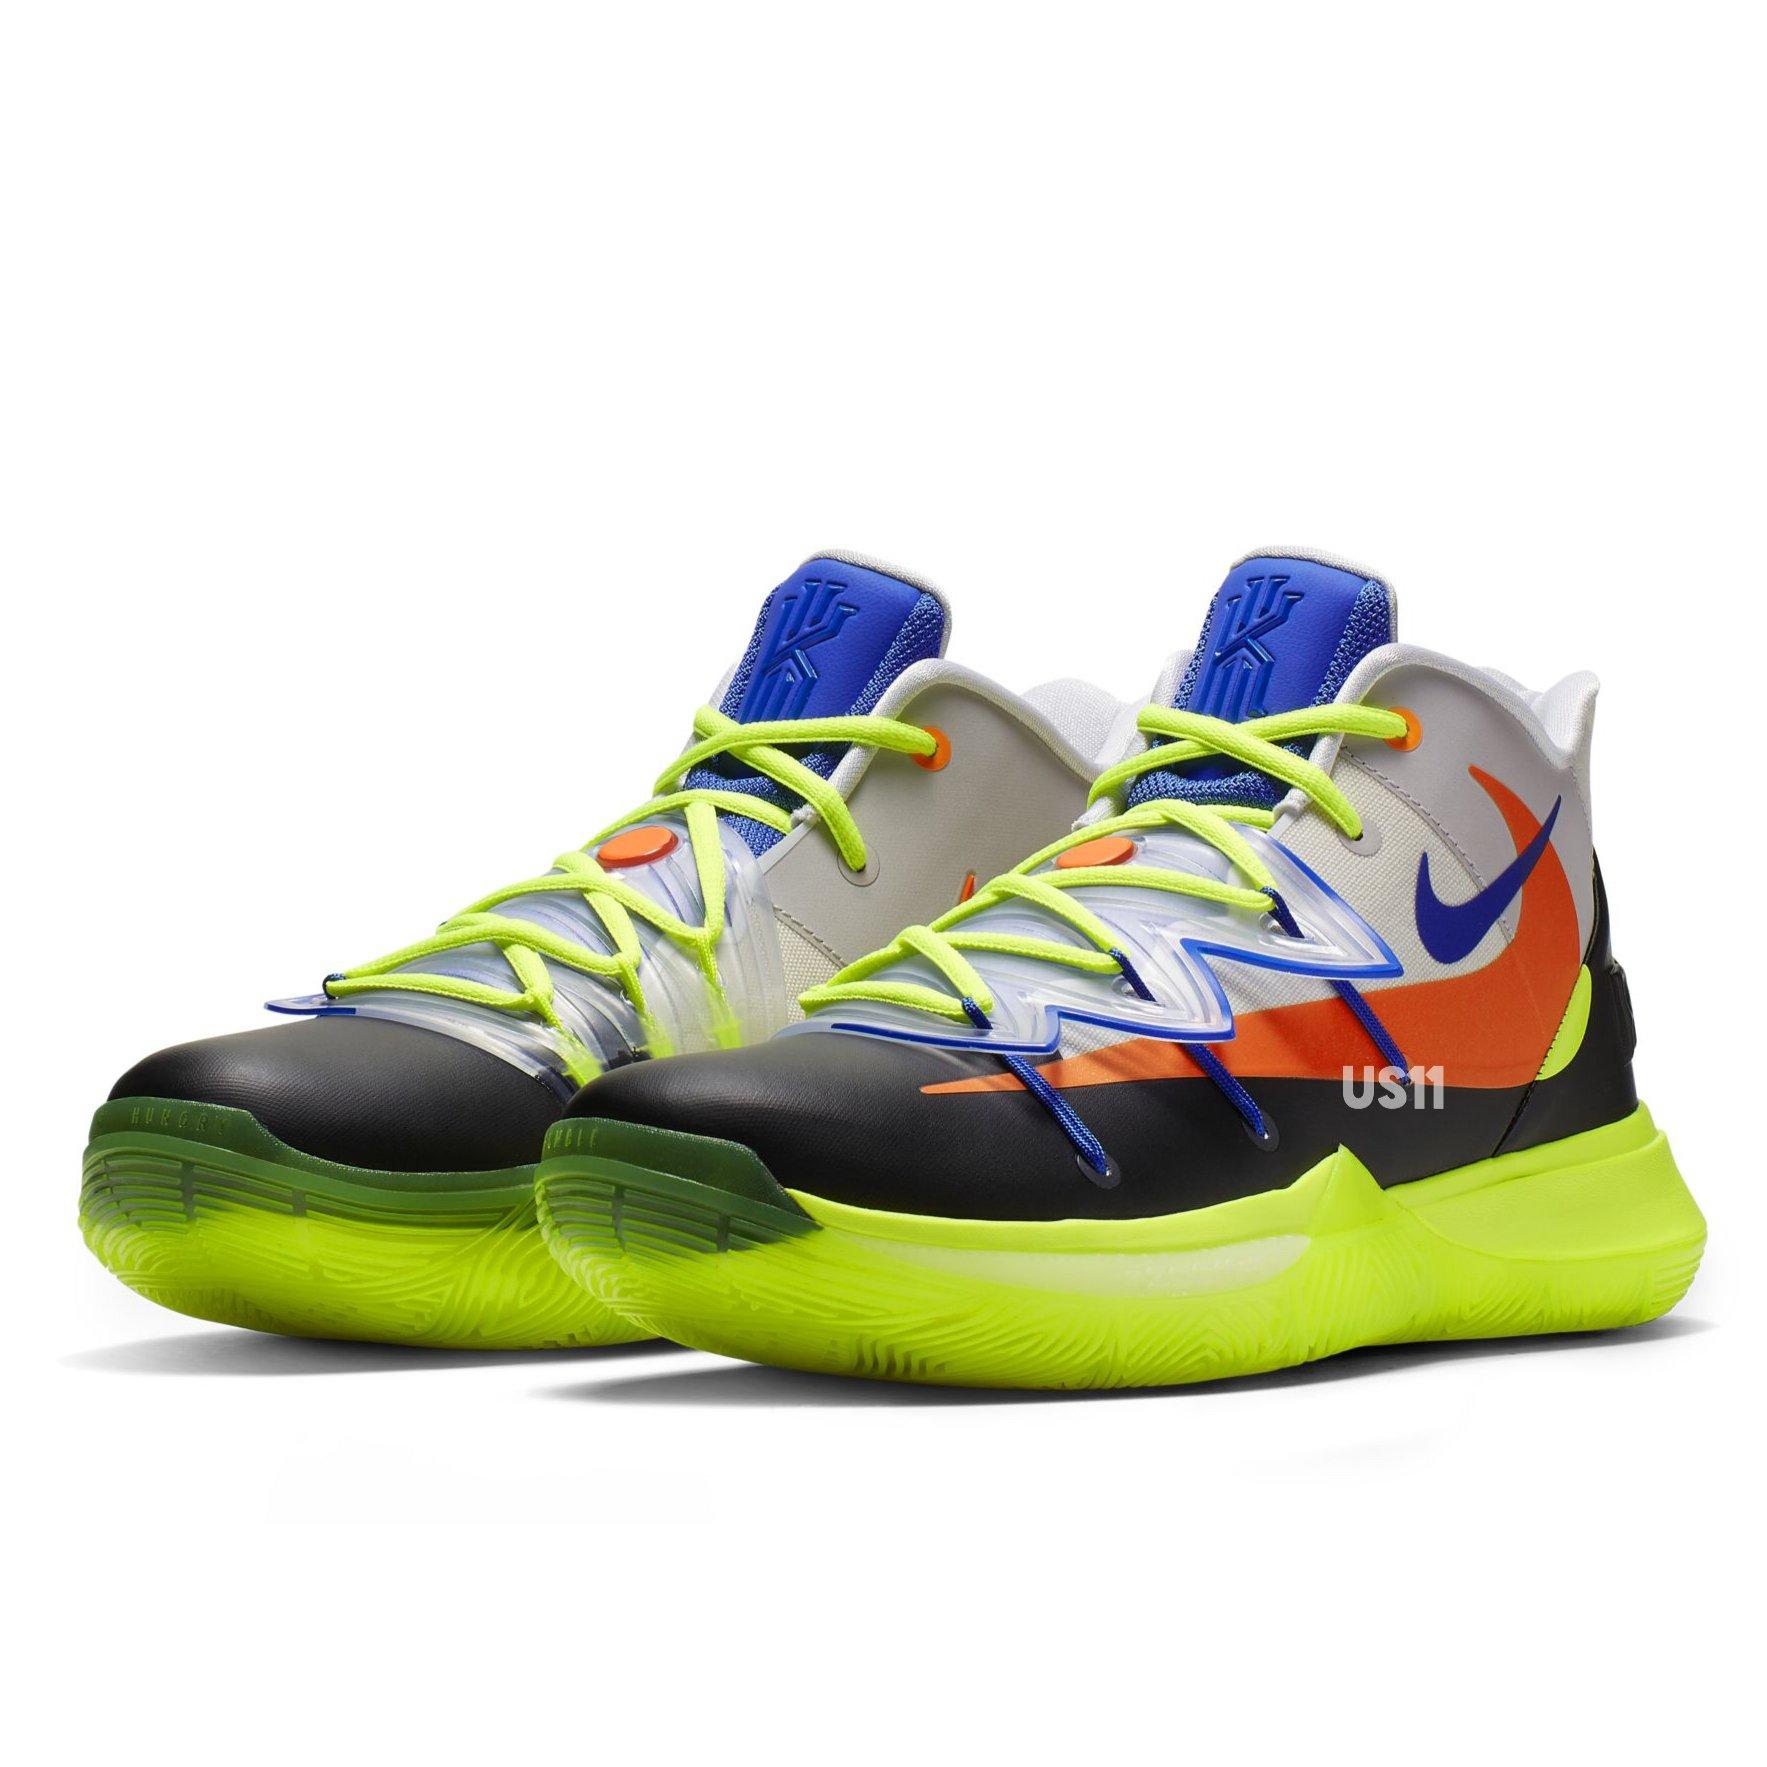 The Nike Kyrie 5 Gets an 'All-Star